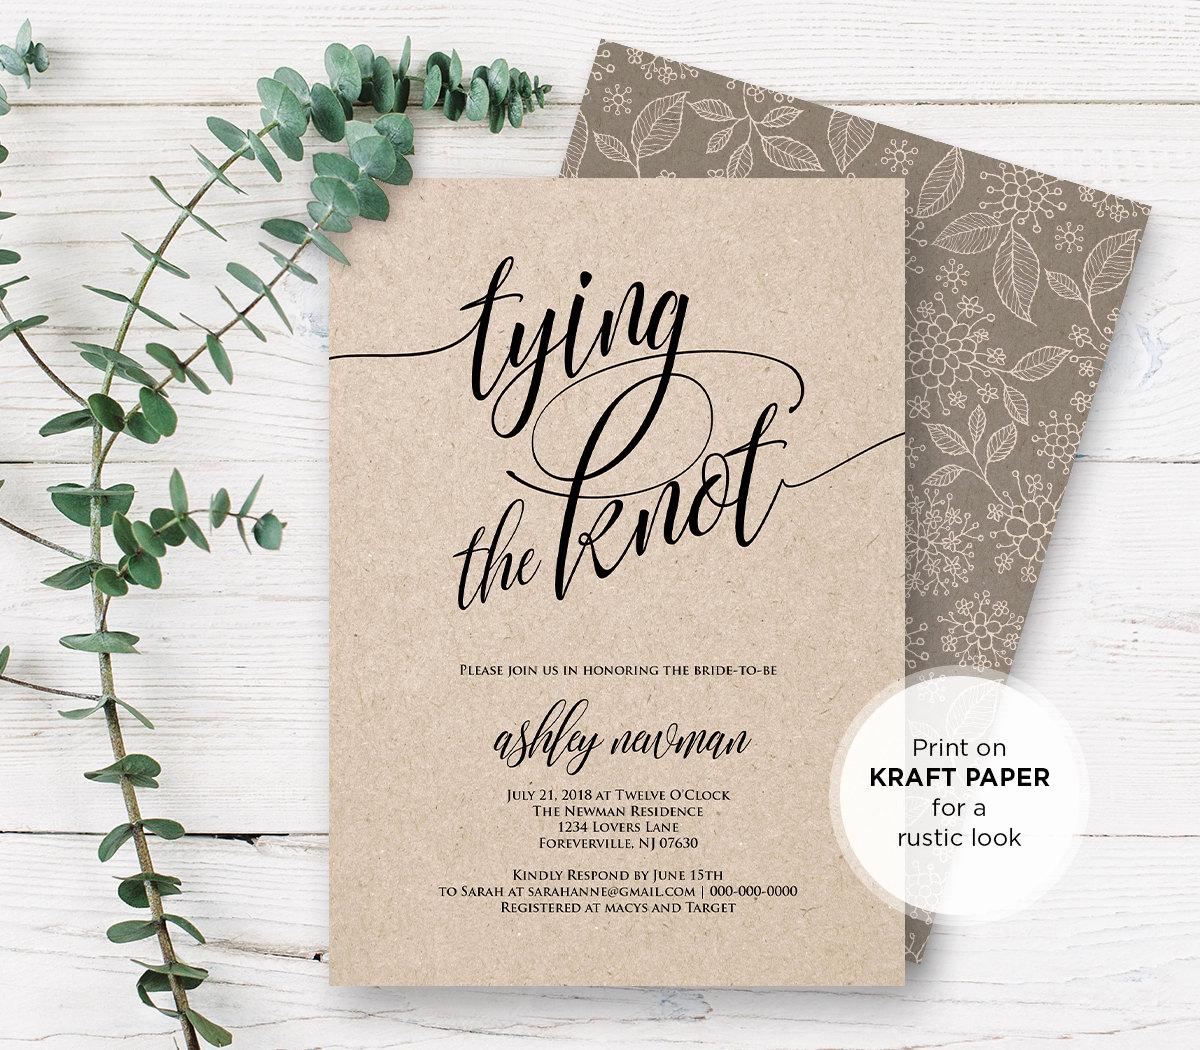 Free Rustic Wedding Invitation Templates Beautiful Rustic Bridal Shower Invitation Printable Tying the Knot